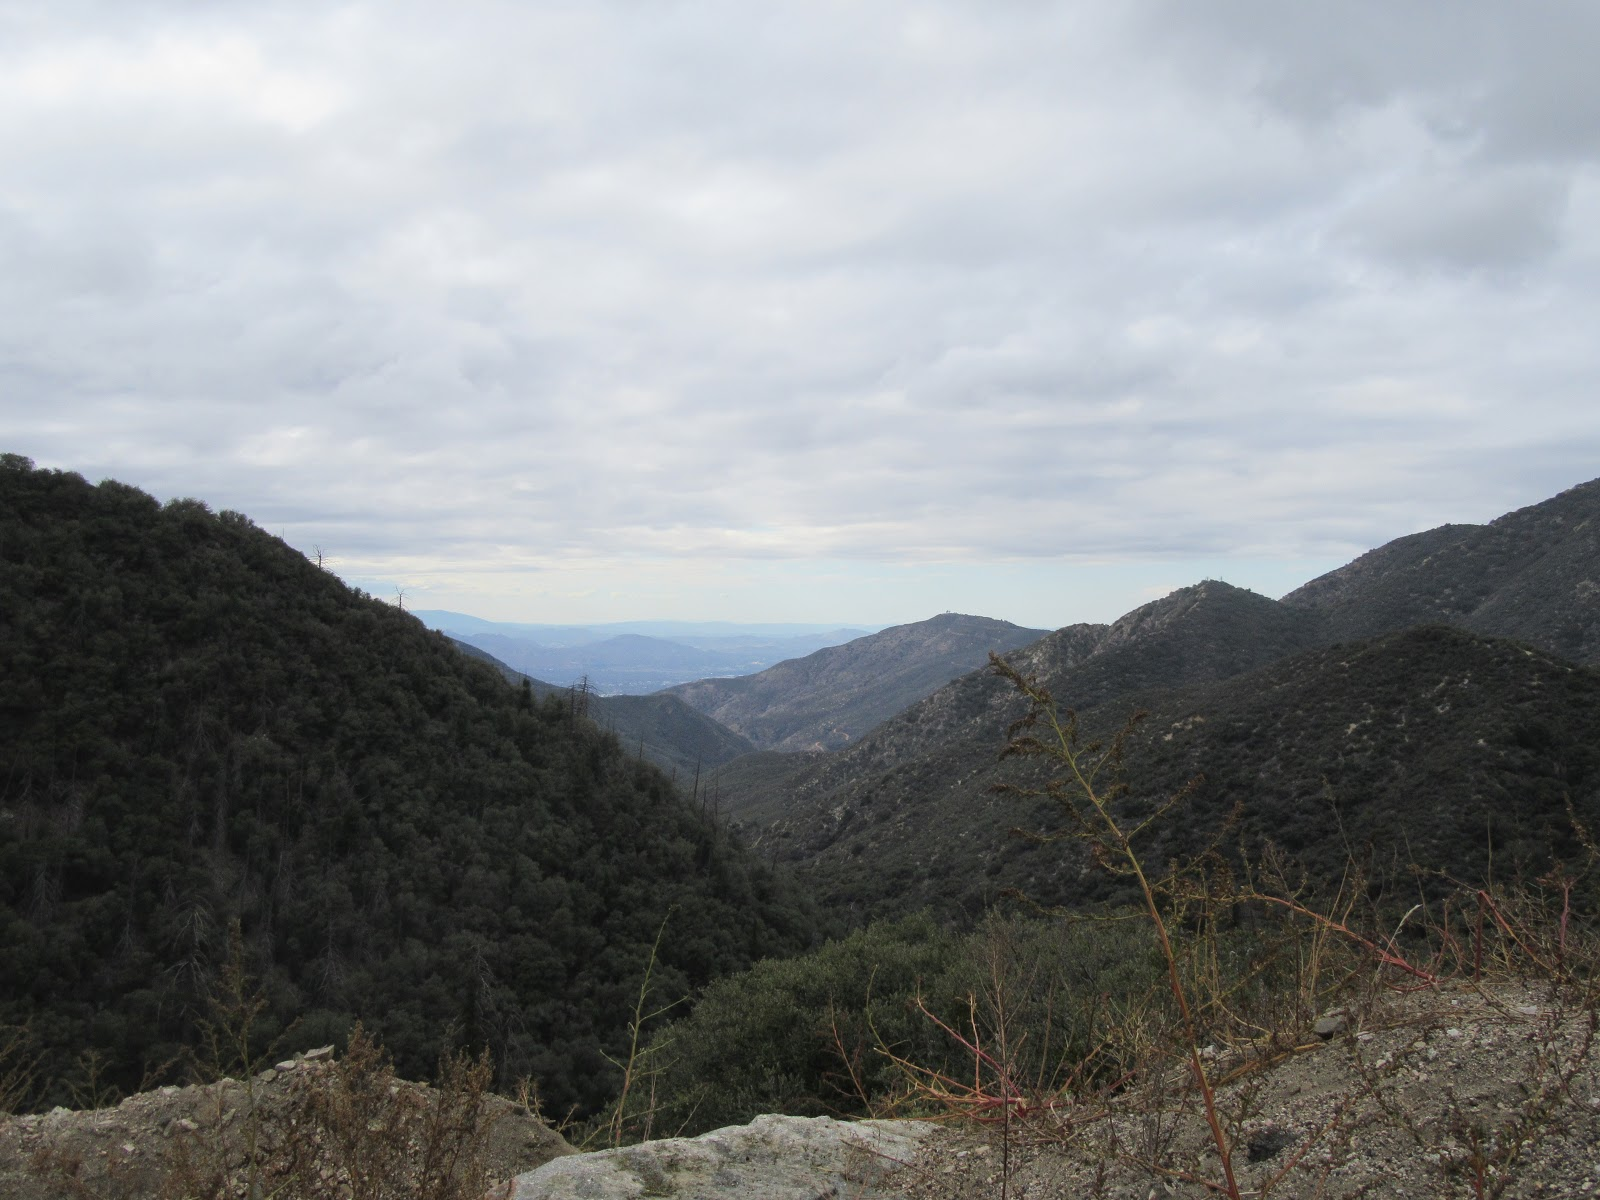 View down San Bernardino Forest climbing Hwy 38 to Onyx Summit by bike.